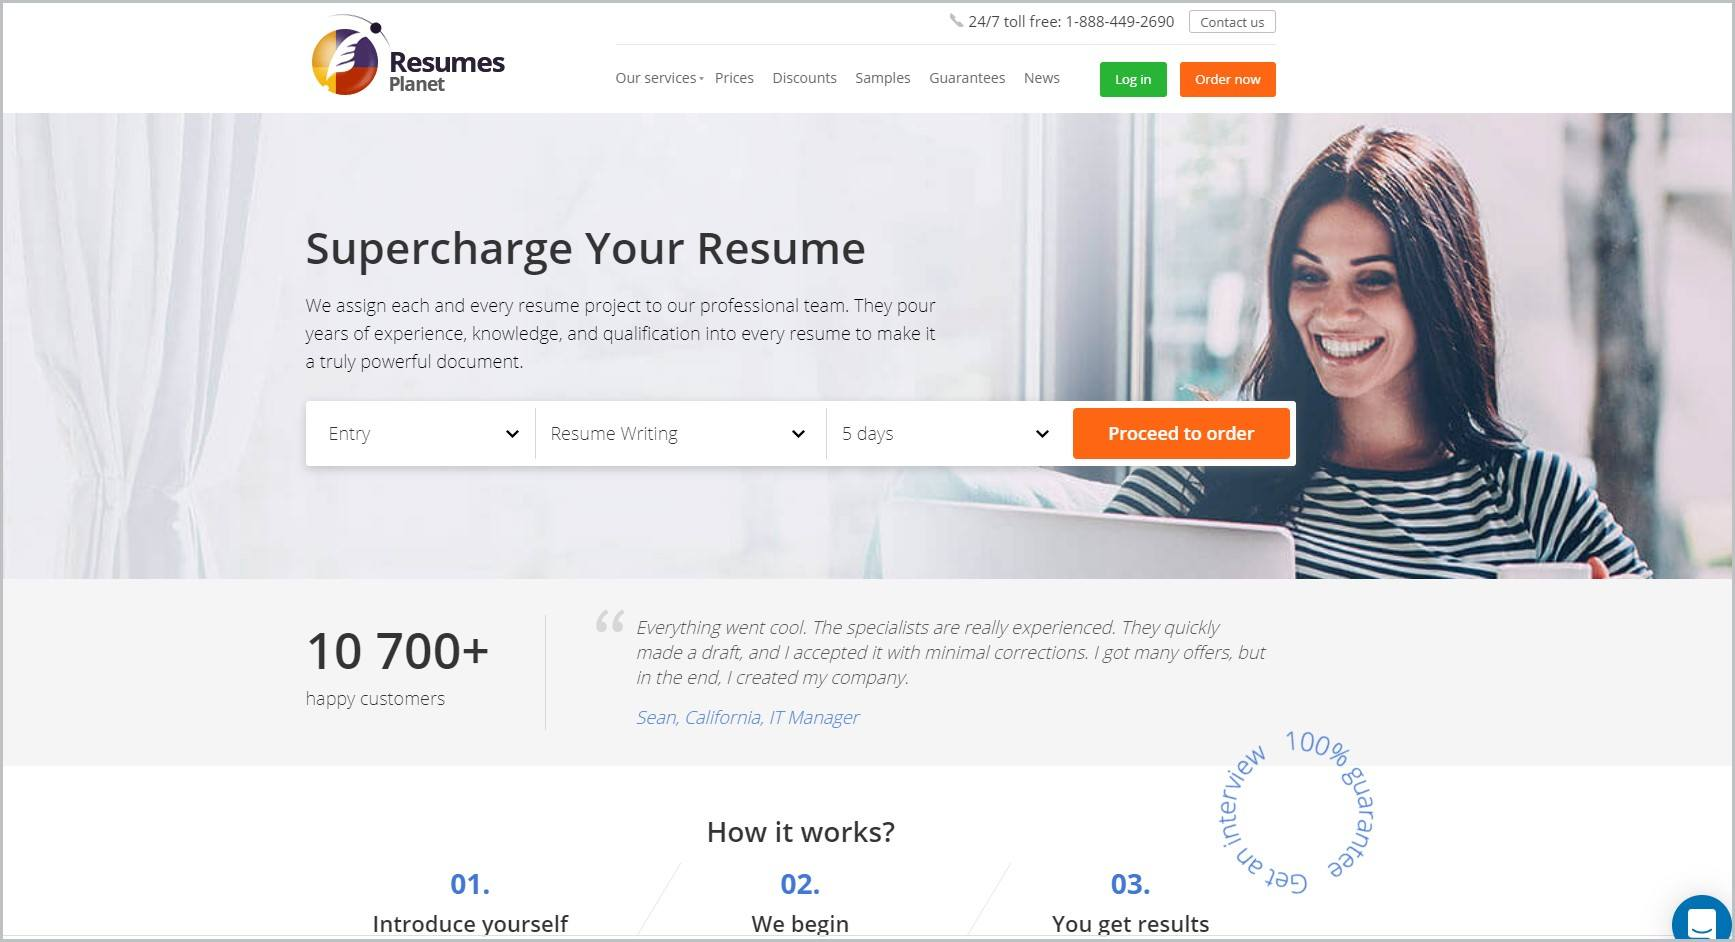 screenshot of Resumes Planet homepage